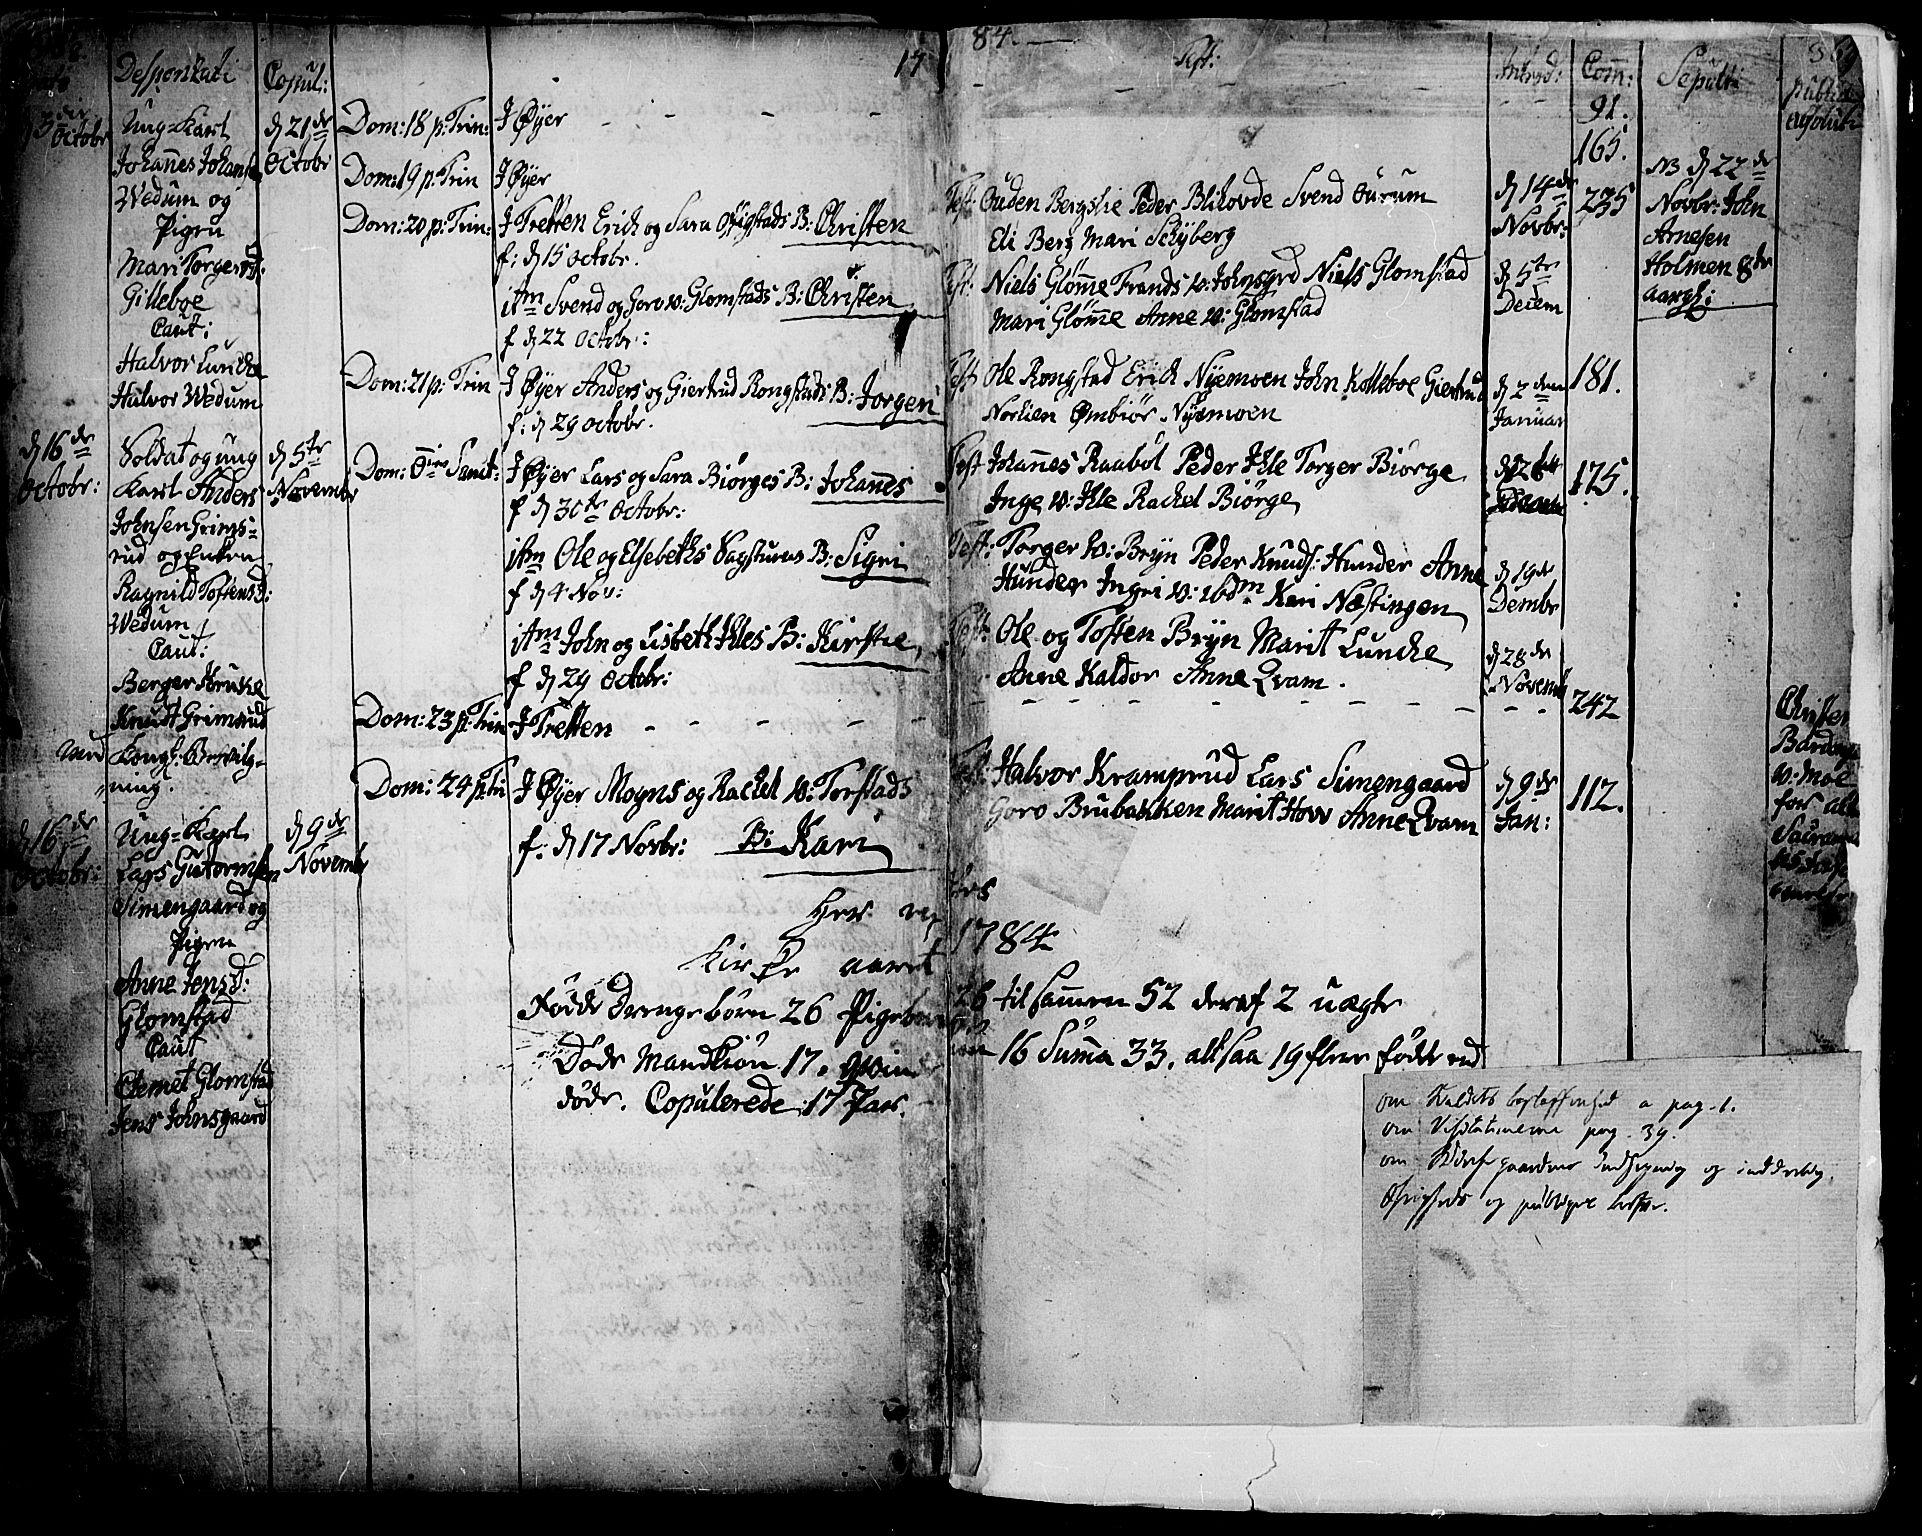 SAH, Øyer prestekontor, Ministerialbok nr. 2, 1733-1784, s. 368-369